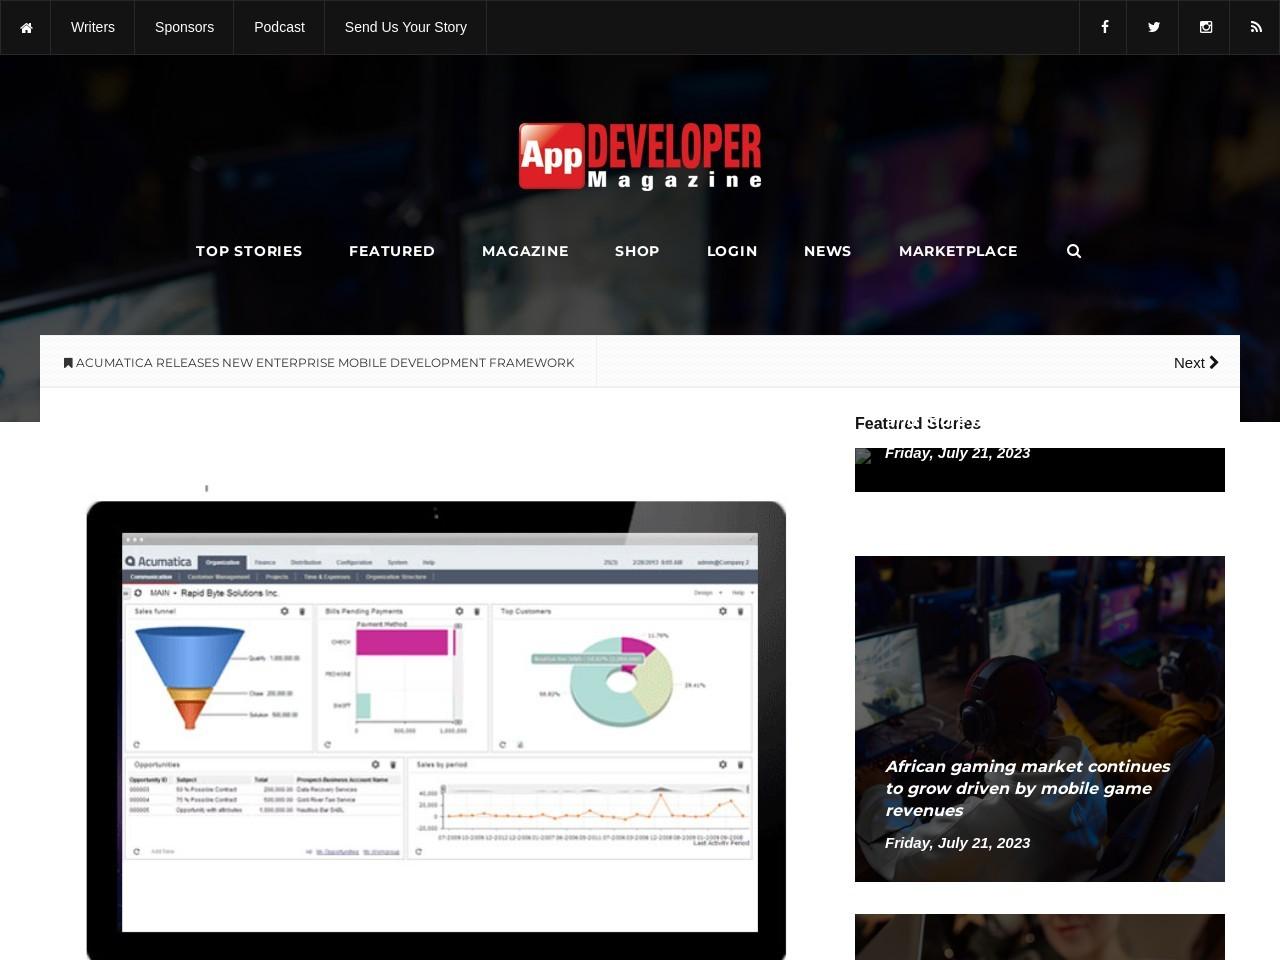 Acumatica Releases New Enterprise Mobile Development Framework